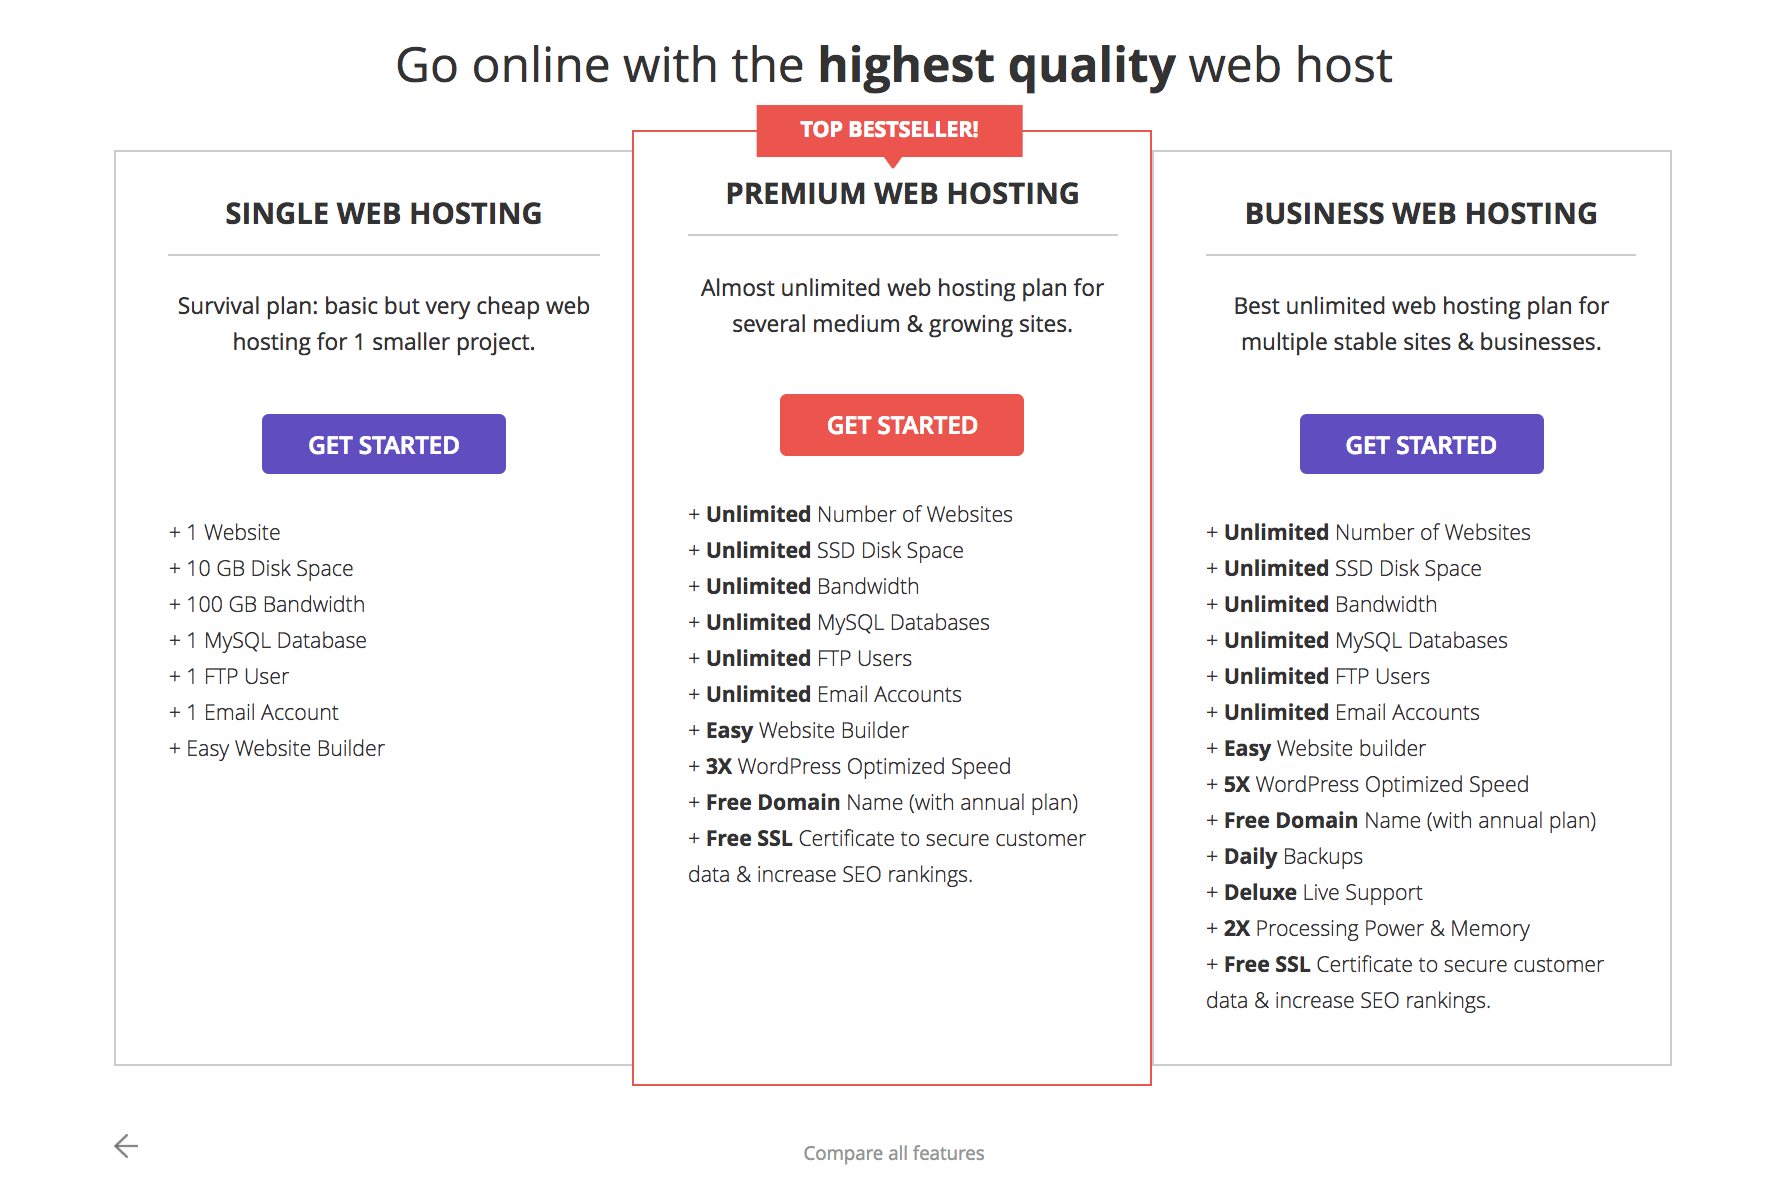 Hostinger - A High Quality Affordable Web Hosting - SmallEnvelop